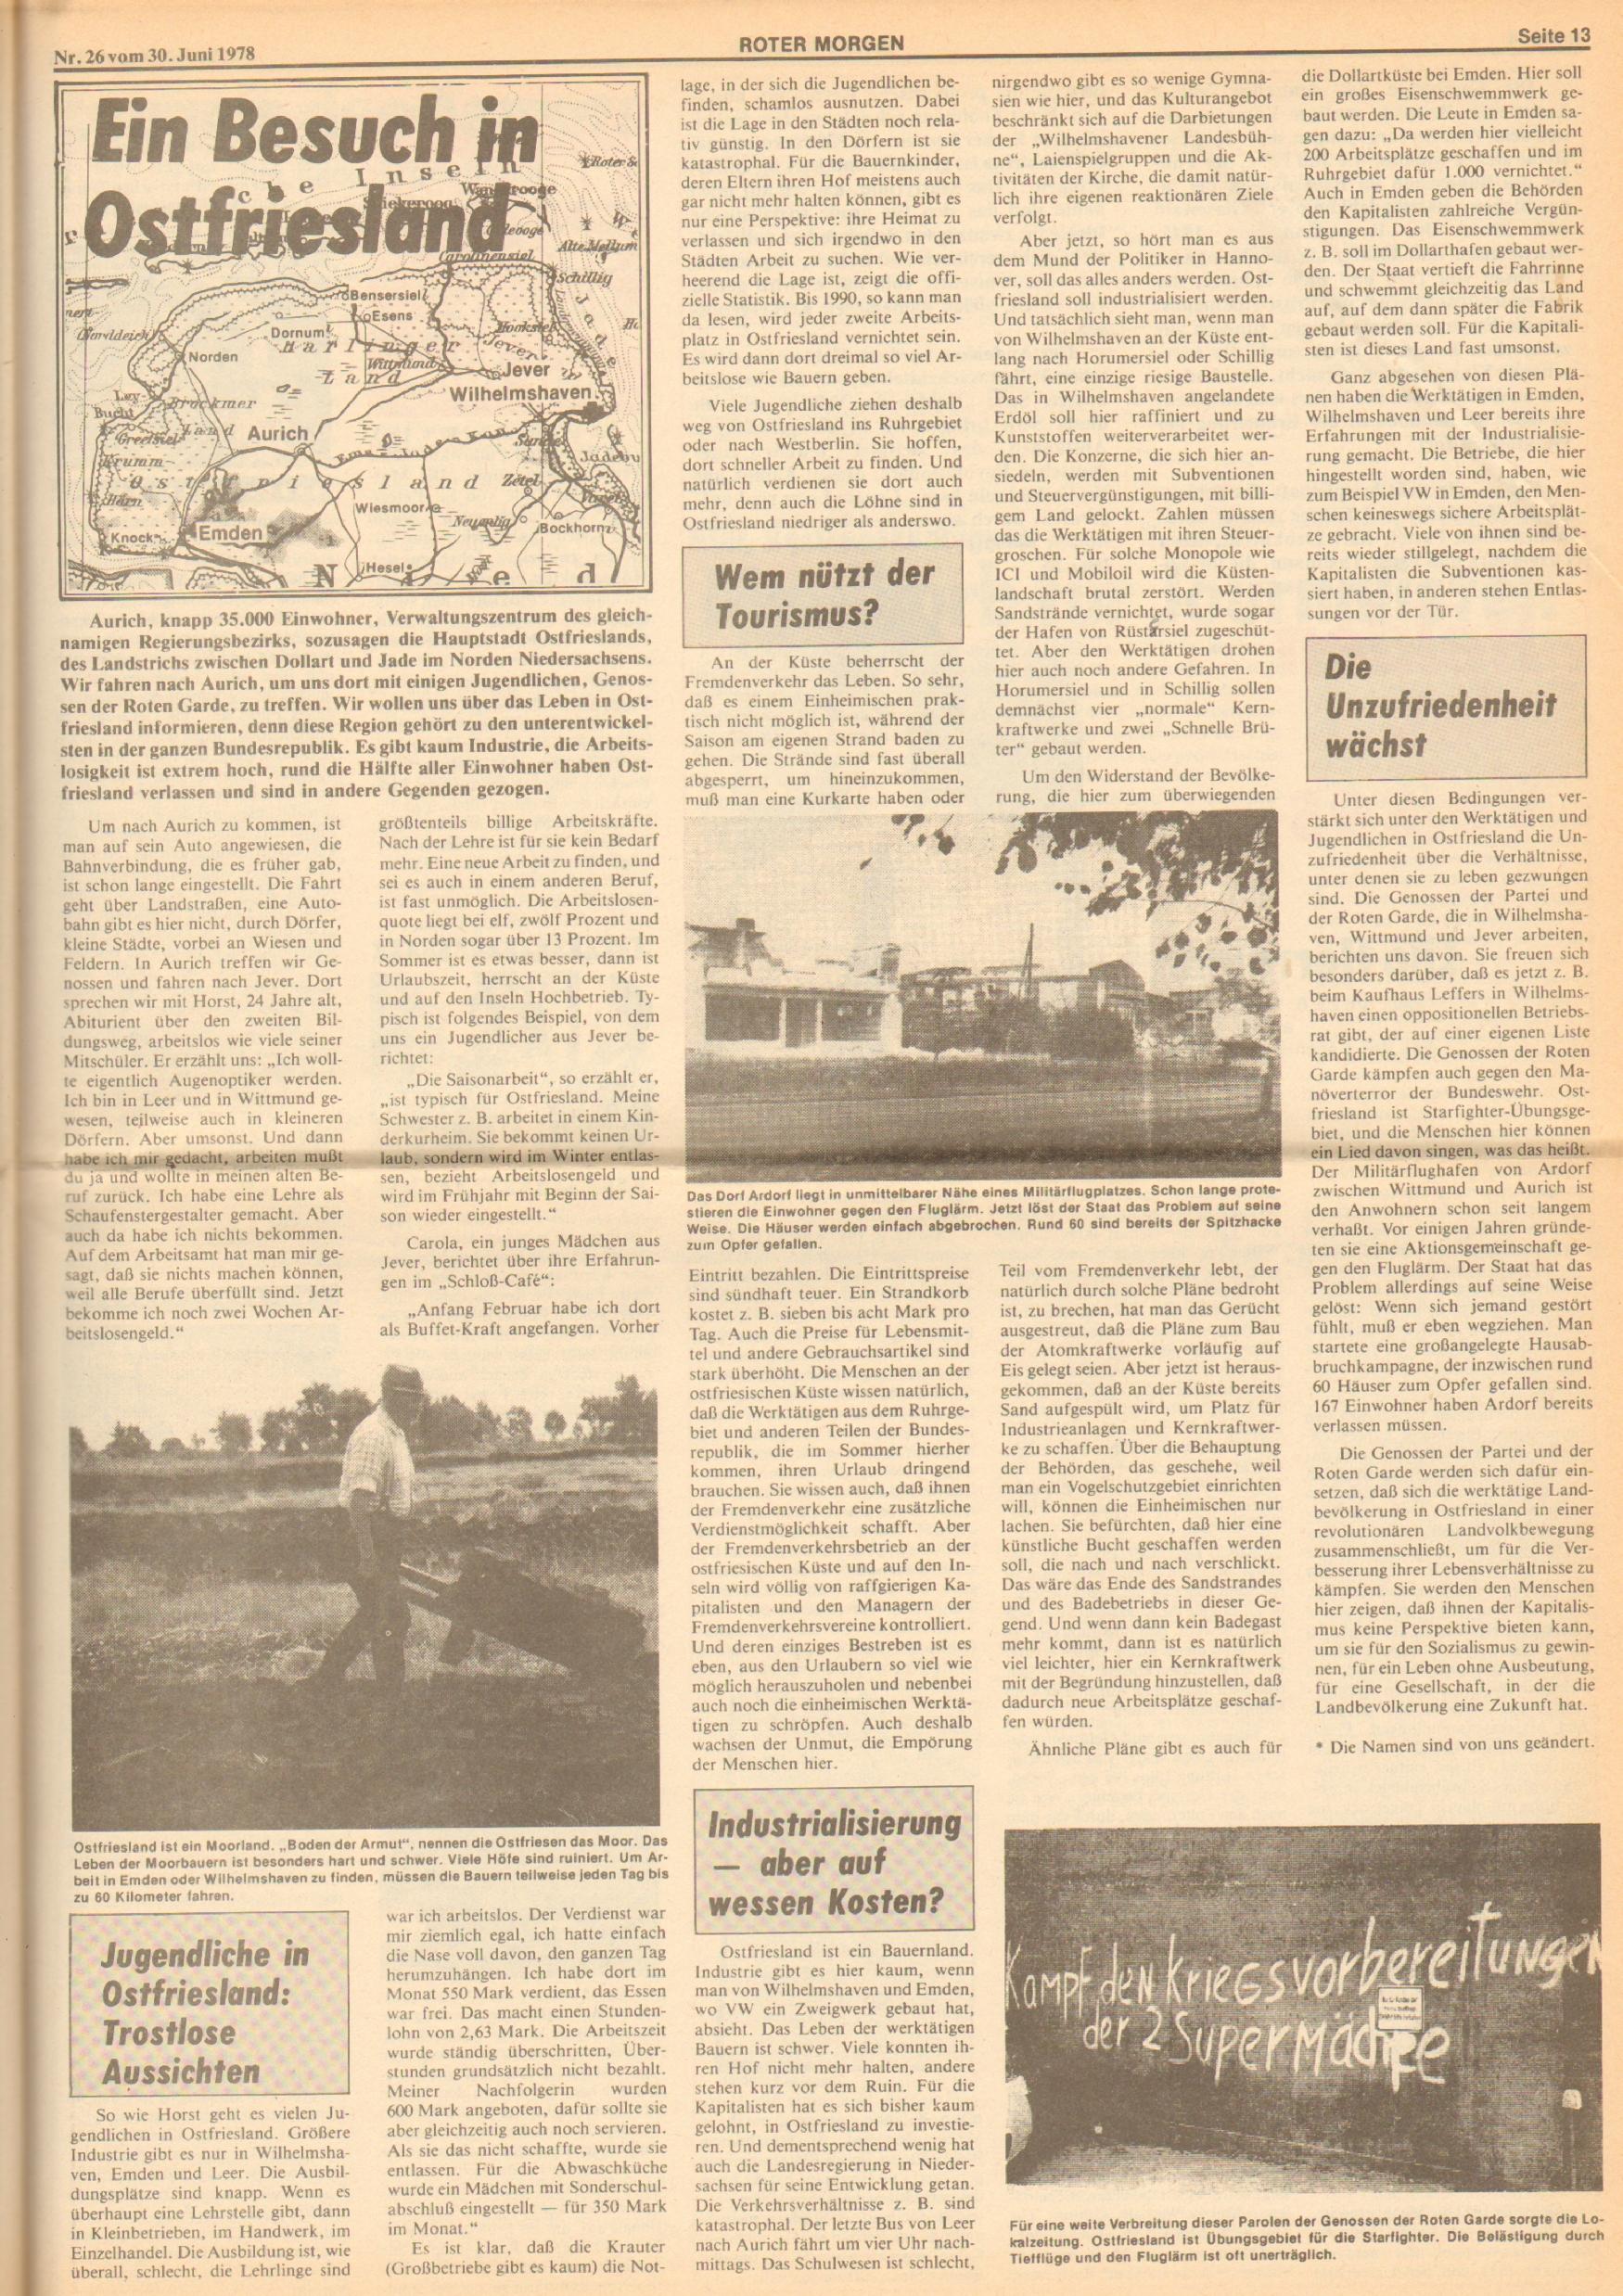 Roter Morgen, 12. Jg., 30. Juni 1978, Nr. 26, Seite 13